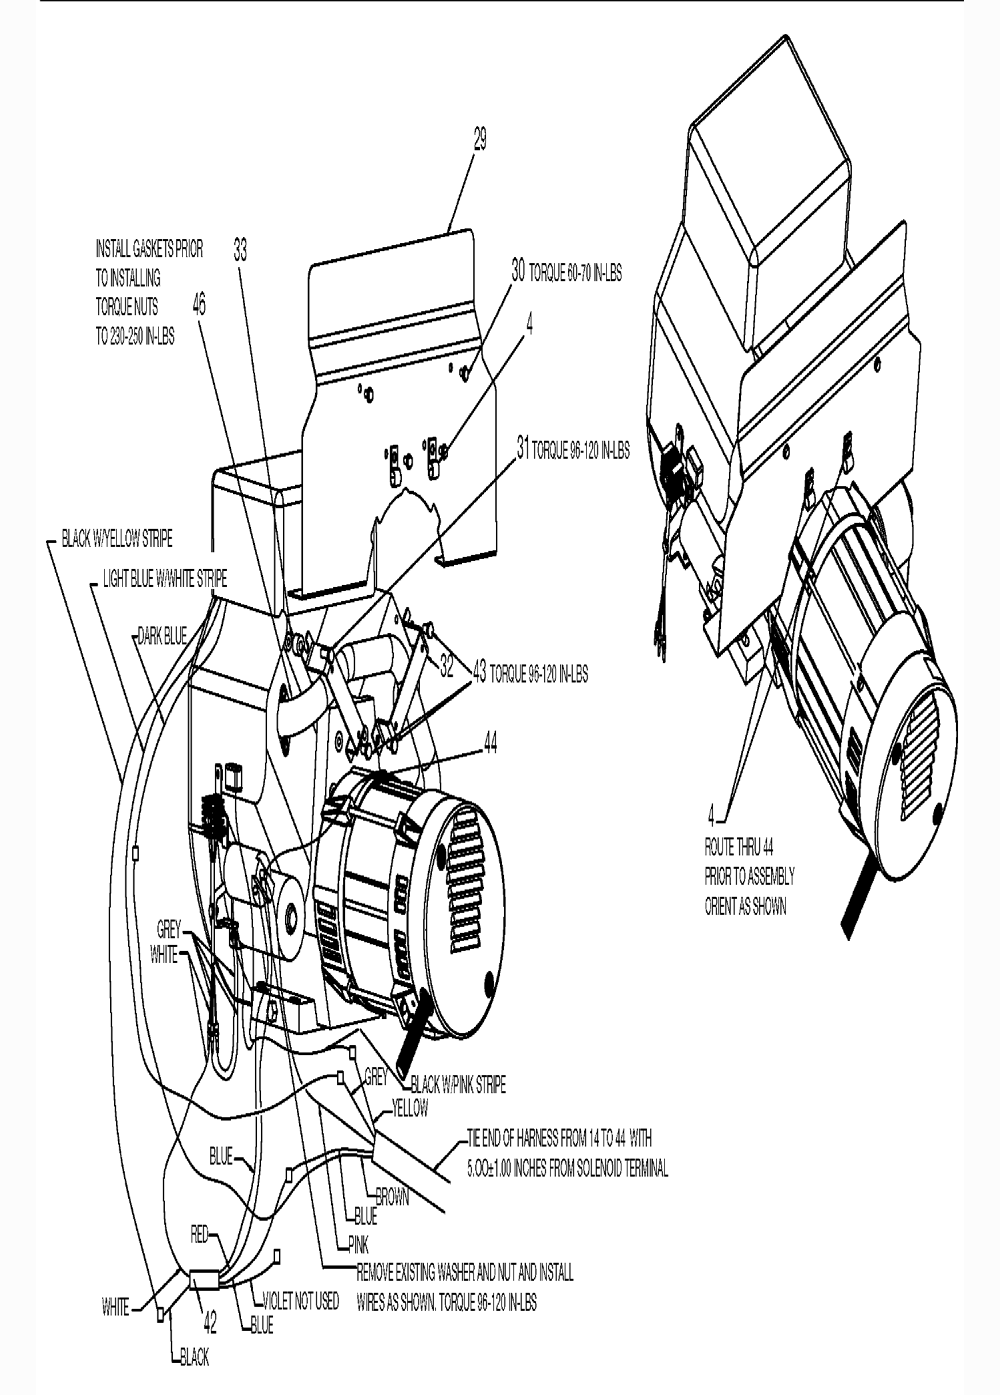 H1000IS-W-Portercable-PB-4Break Down